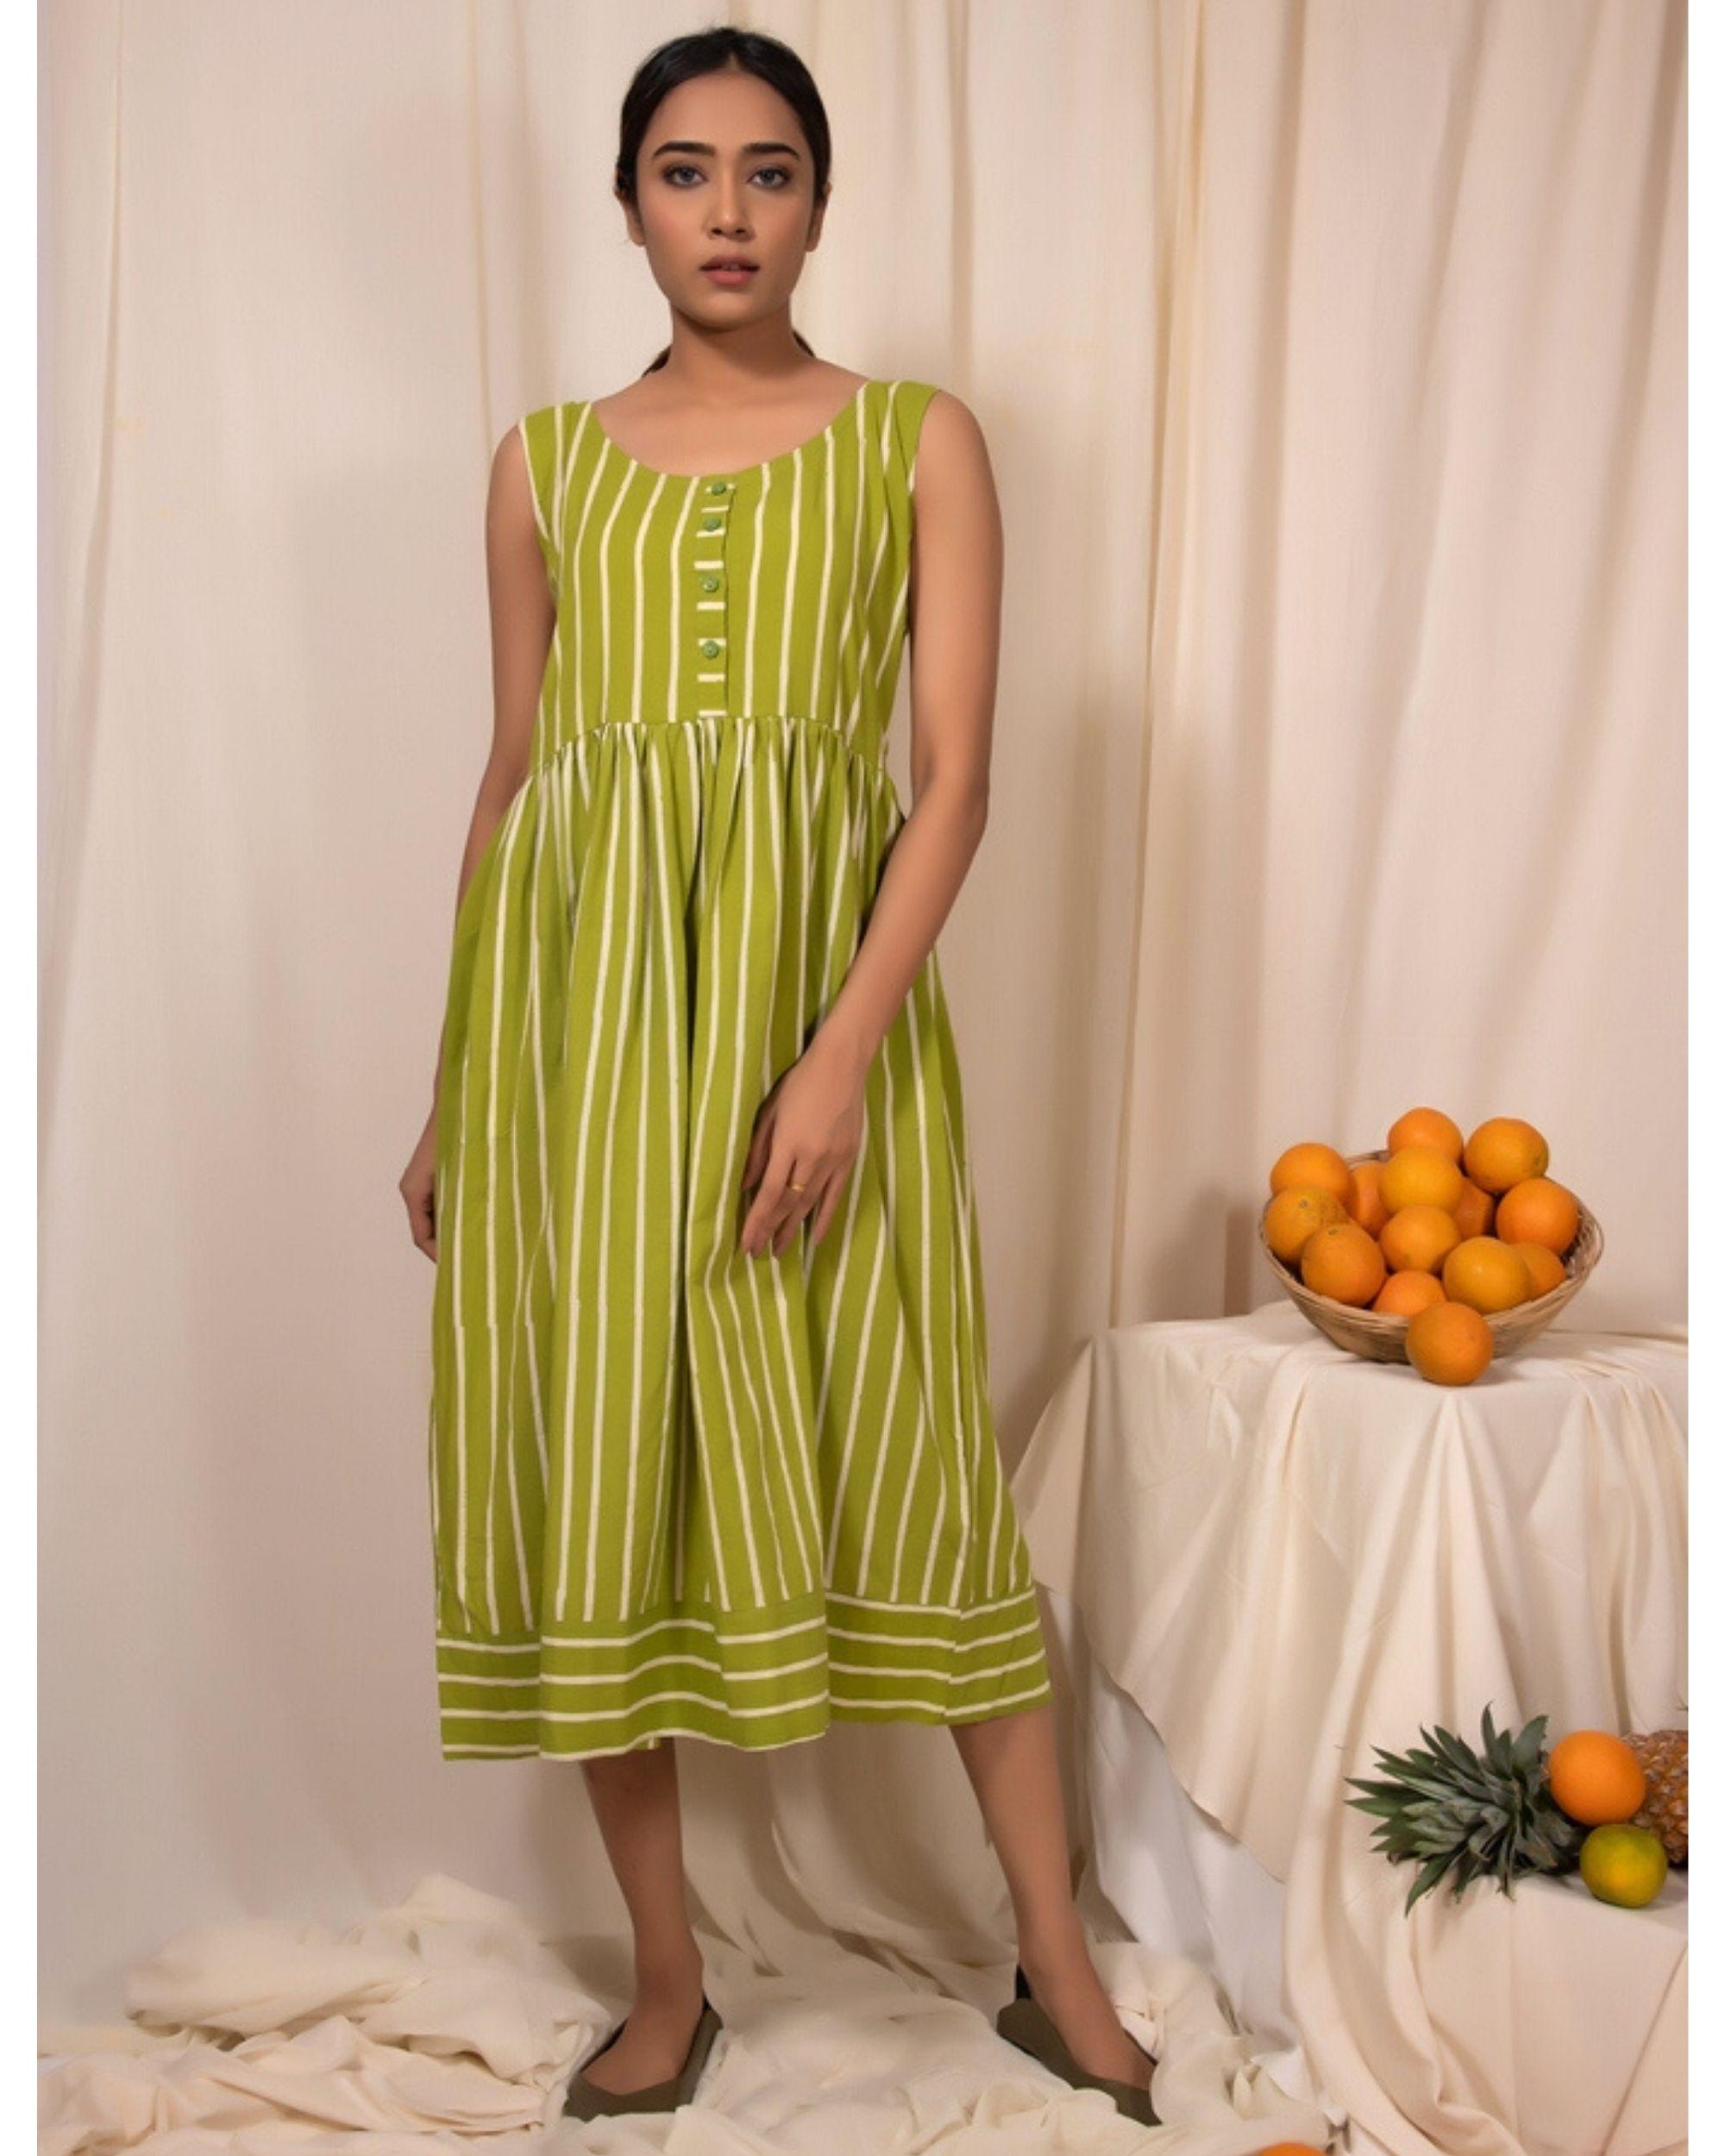 Lime green striped dress